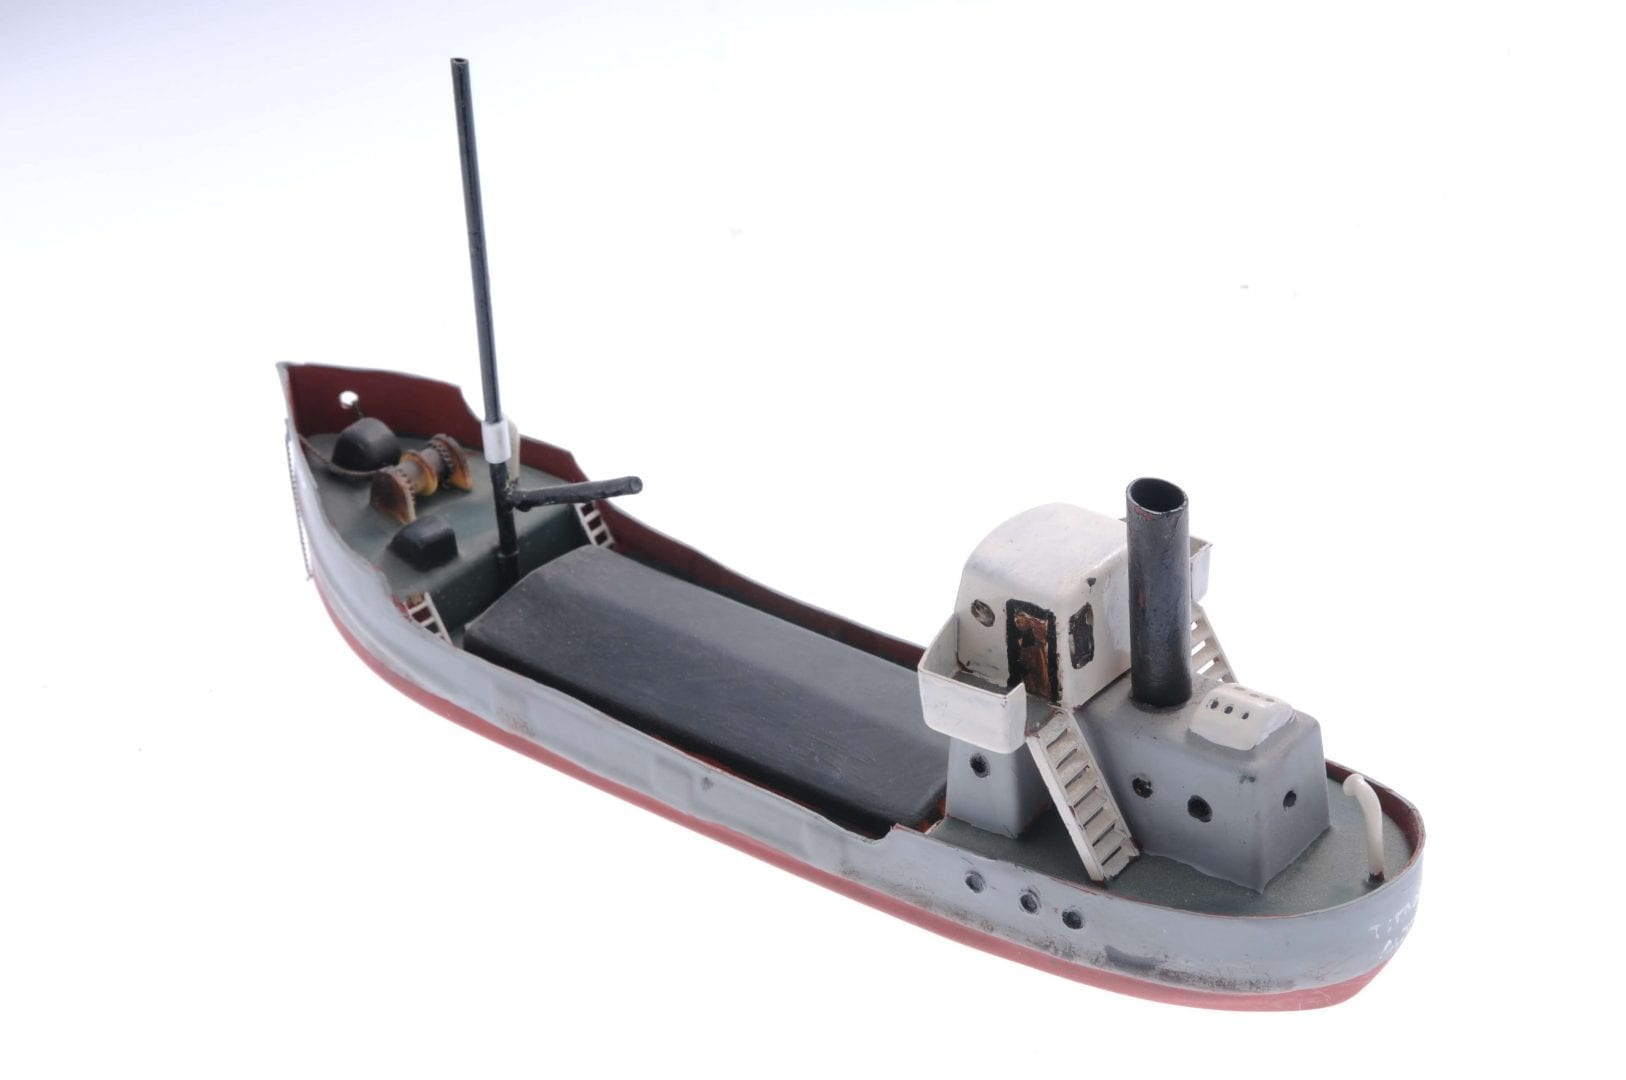 Coaster Boat OO Gauge Scale Model Boat - Sarik Hobbies - for the Model Builder